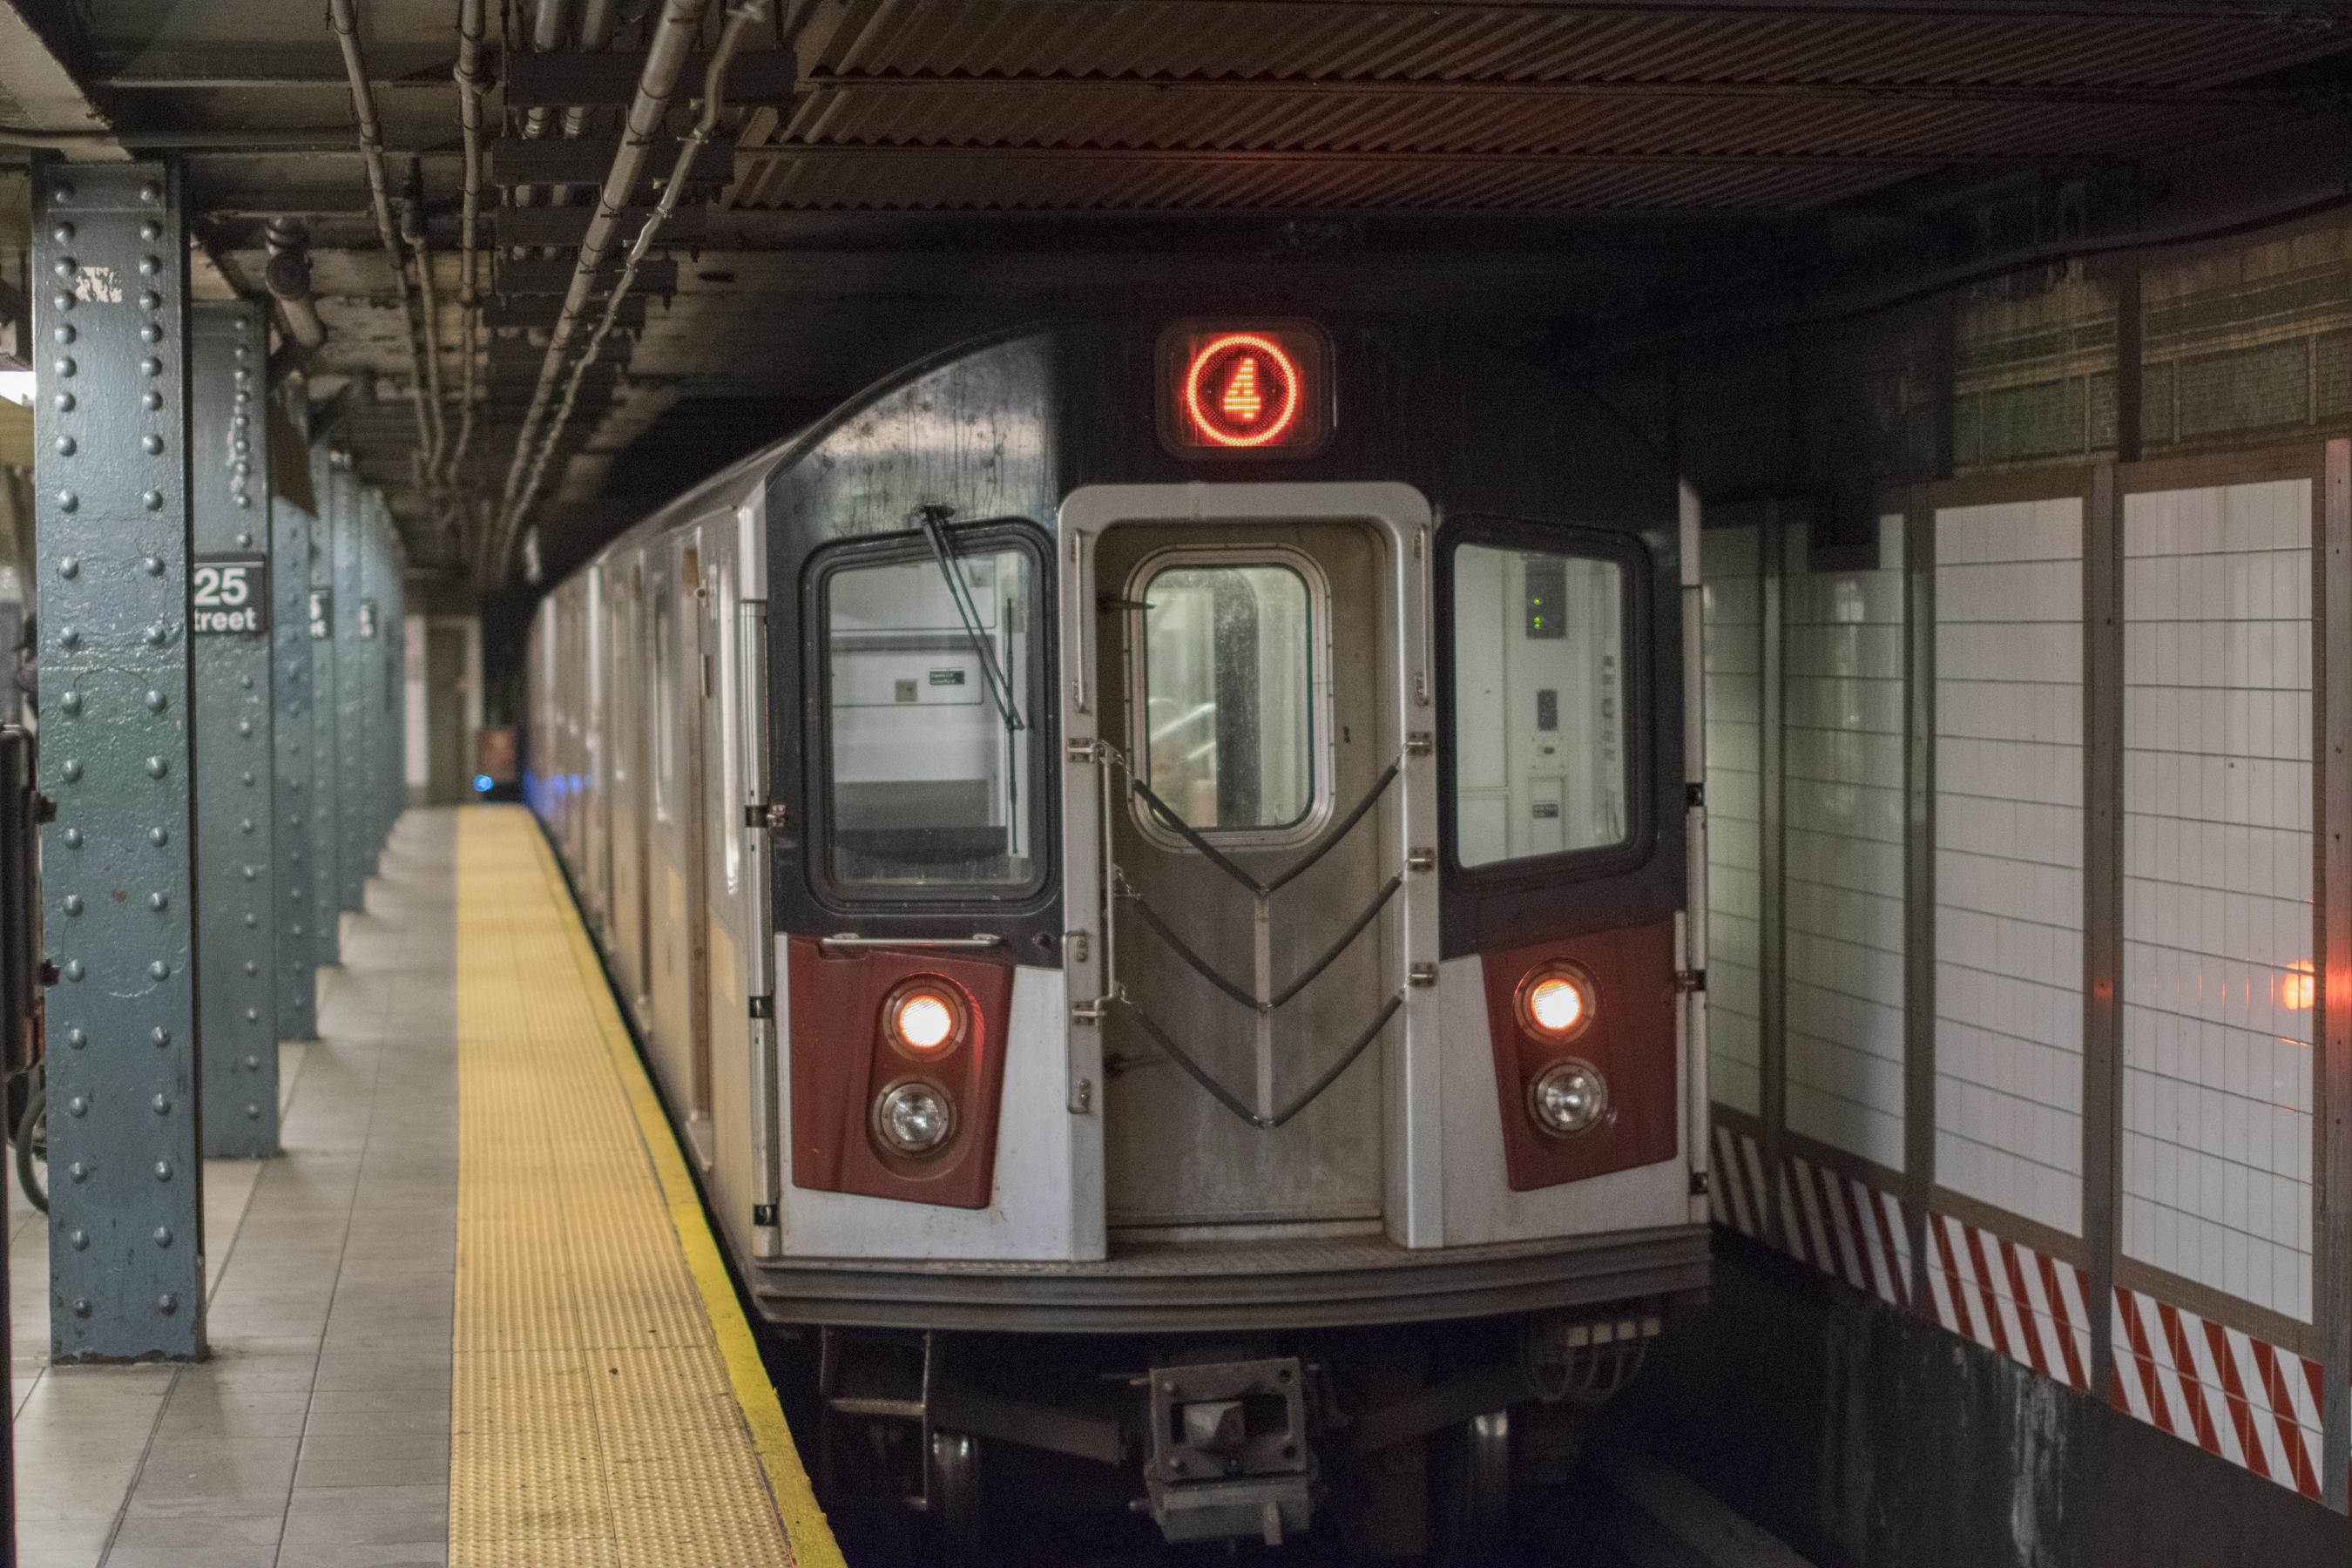 Subway Map Nyc 4 Train.4 New York City Subway Service Wikipedia